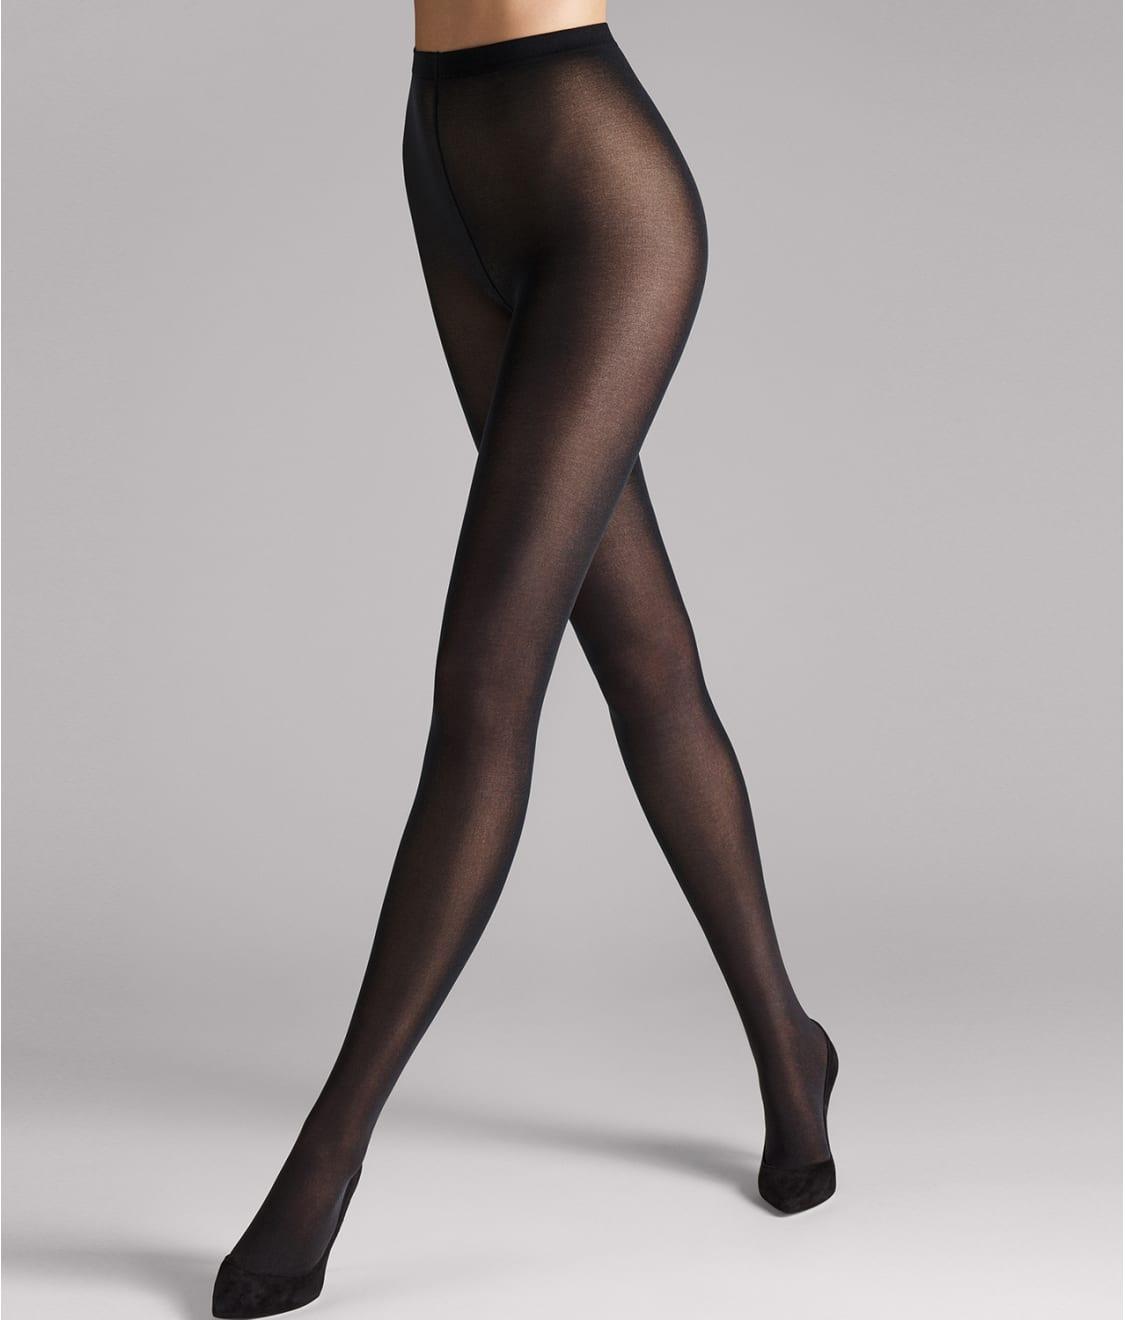 15f549a36d989 Wolford Velvet de Luxe 50 Denier Tights | Bare Necessities (106-87)